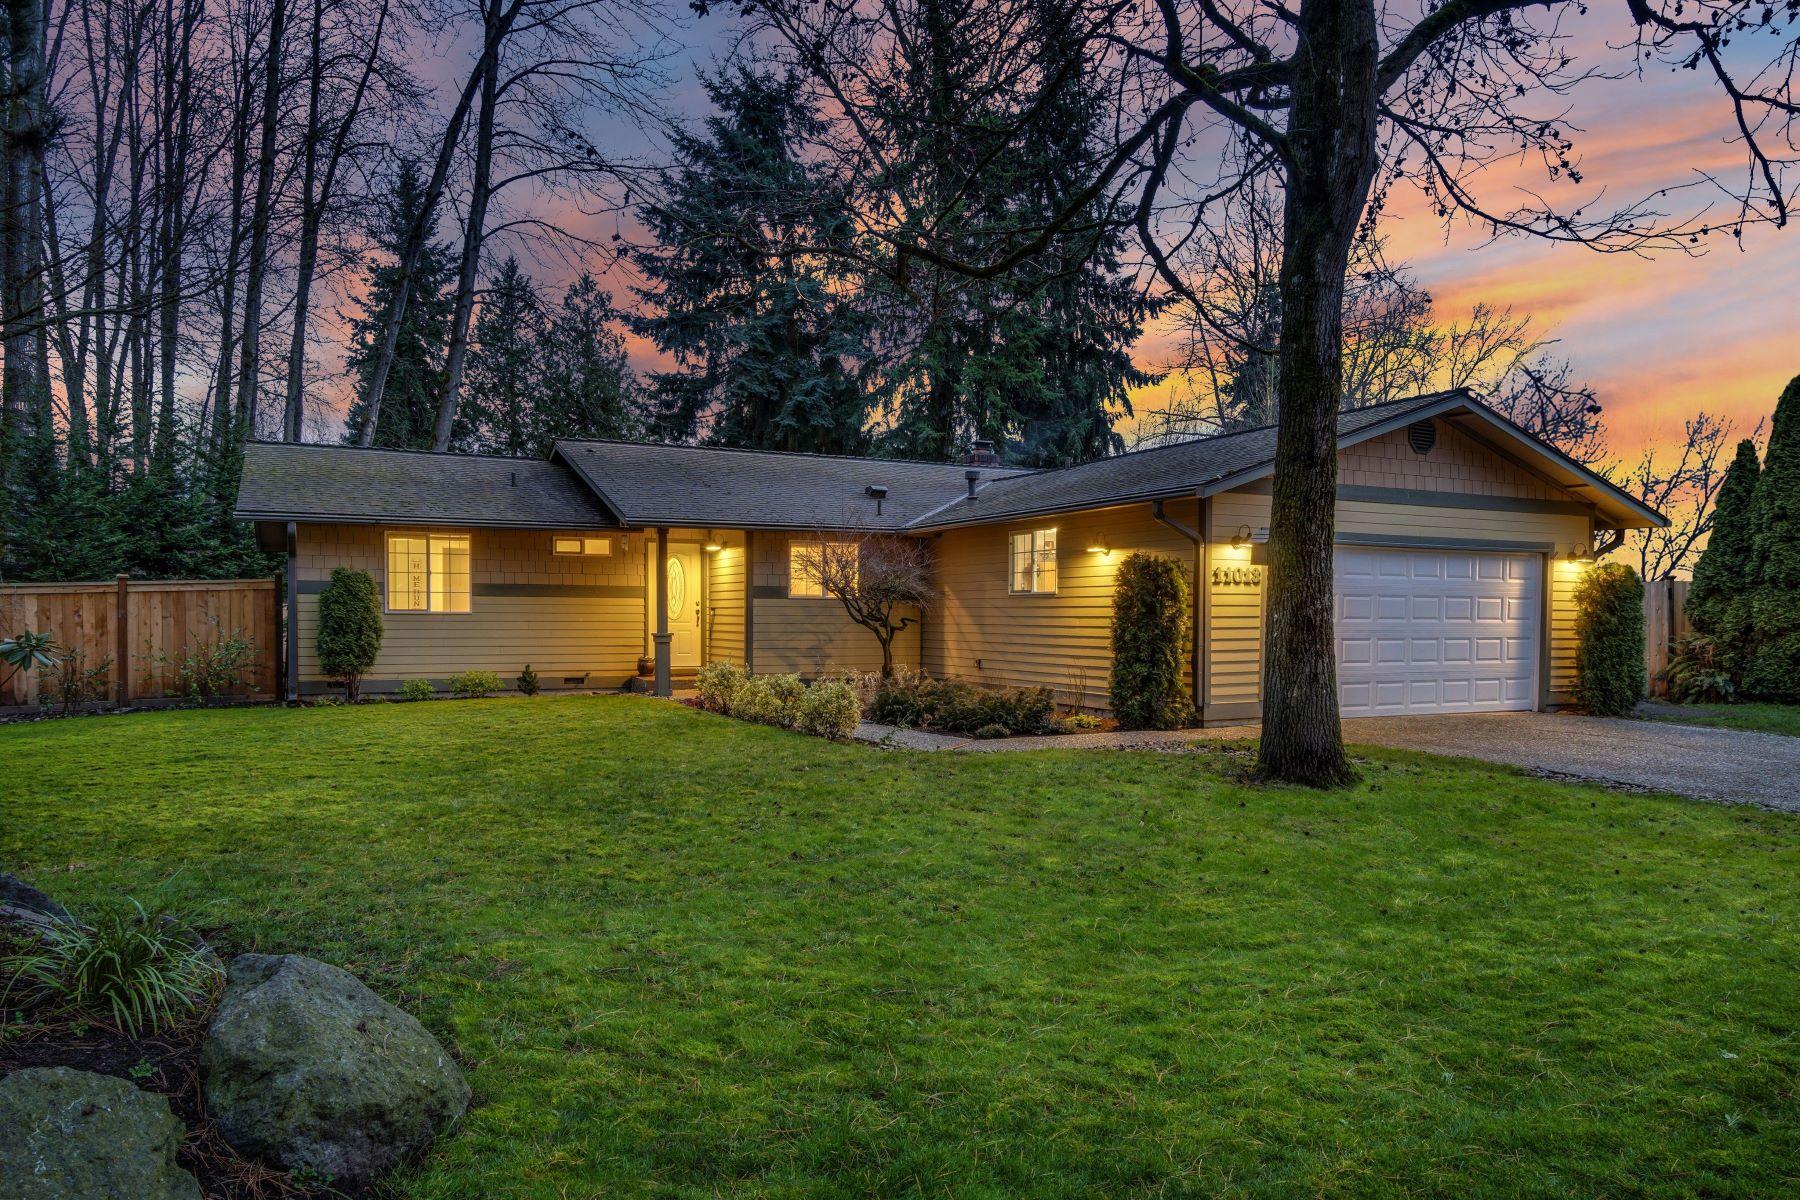 Single Family Homes for Sale at 11013 NE 149th St, Bothell, WA 98011 11013 NE 149th St Bothell, Washington 98011 United States